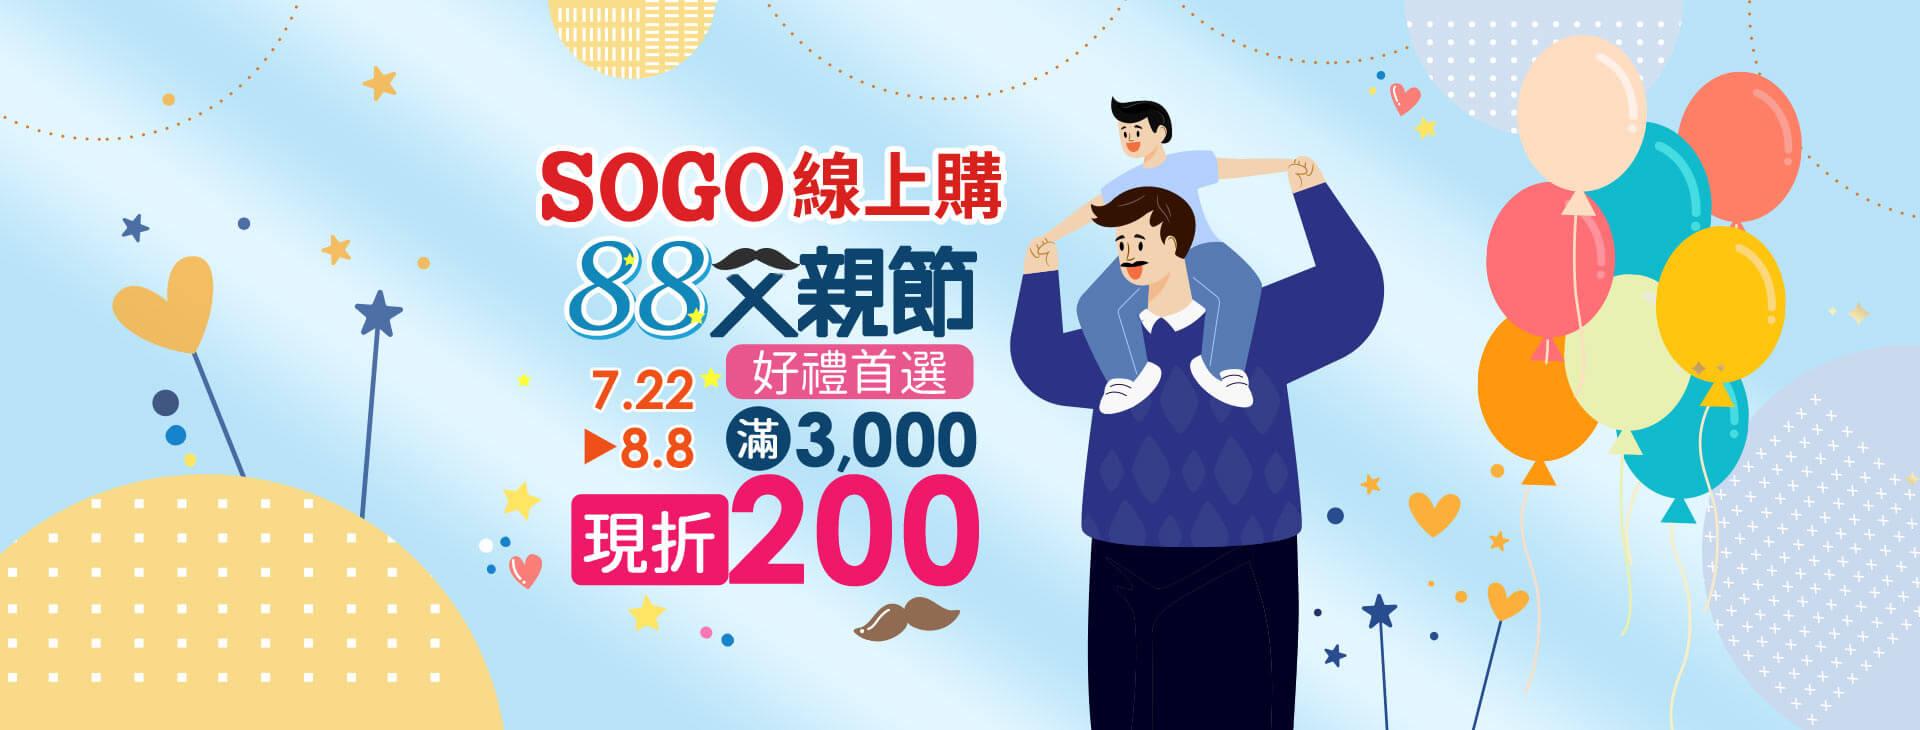 SOGO線上購物「88父親節滿$3000現折$200」